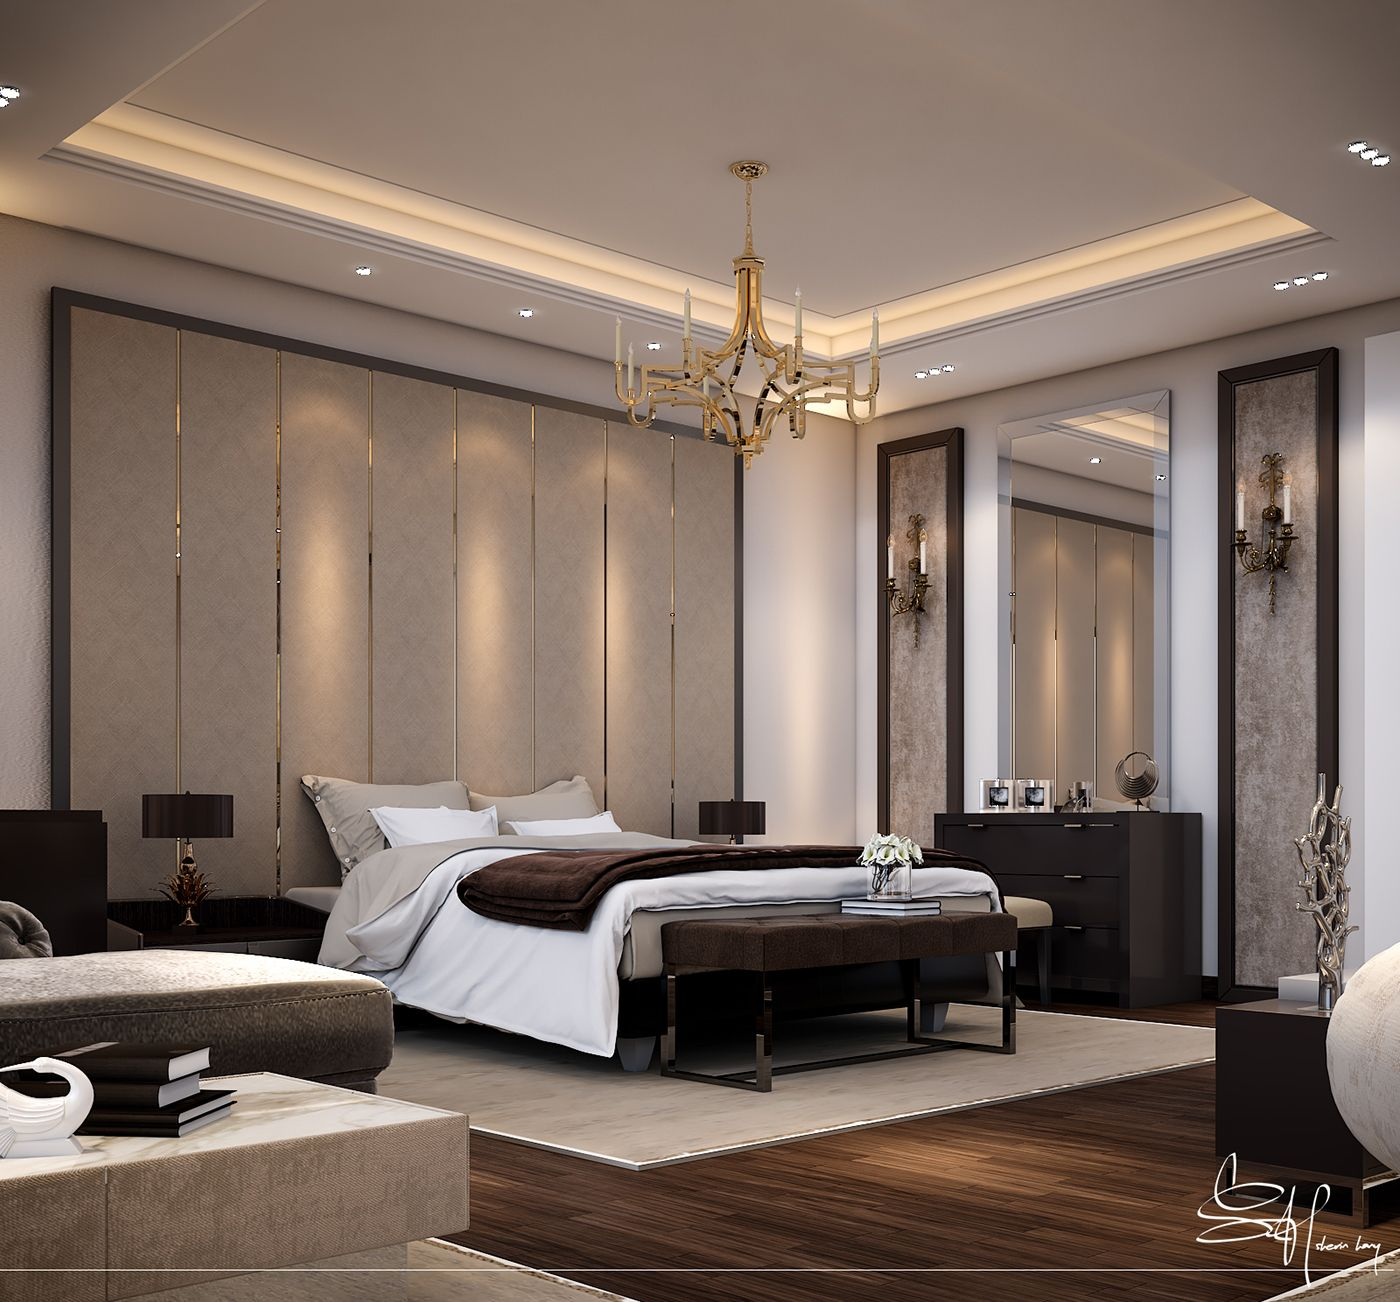 Master bedroom art  MASTER BEDROOM on Behance  Home decor  Pinterest  Master bedroom